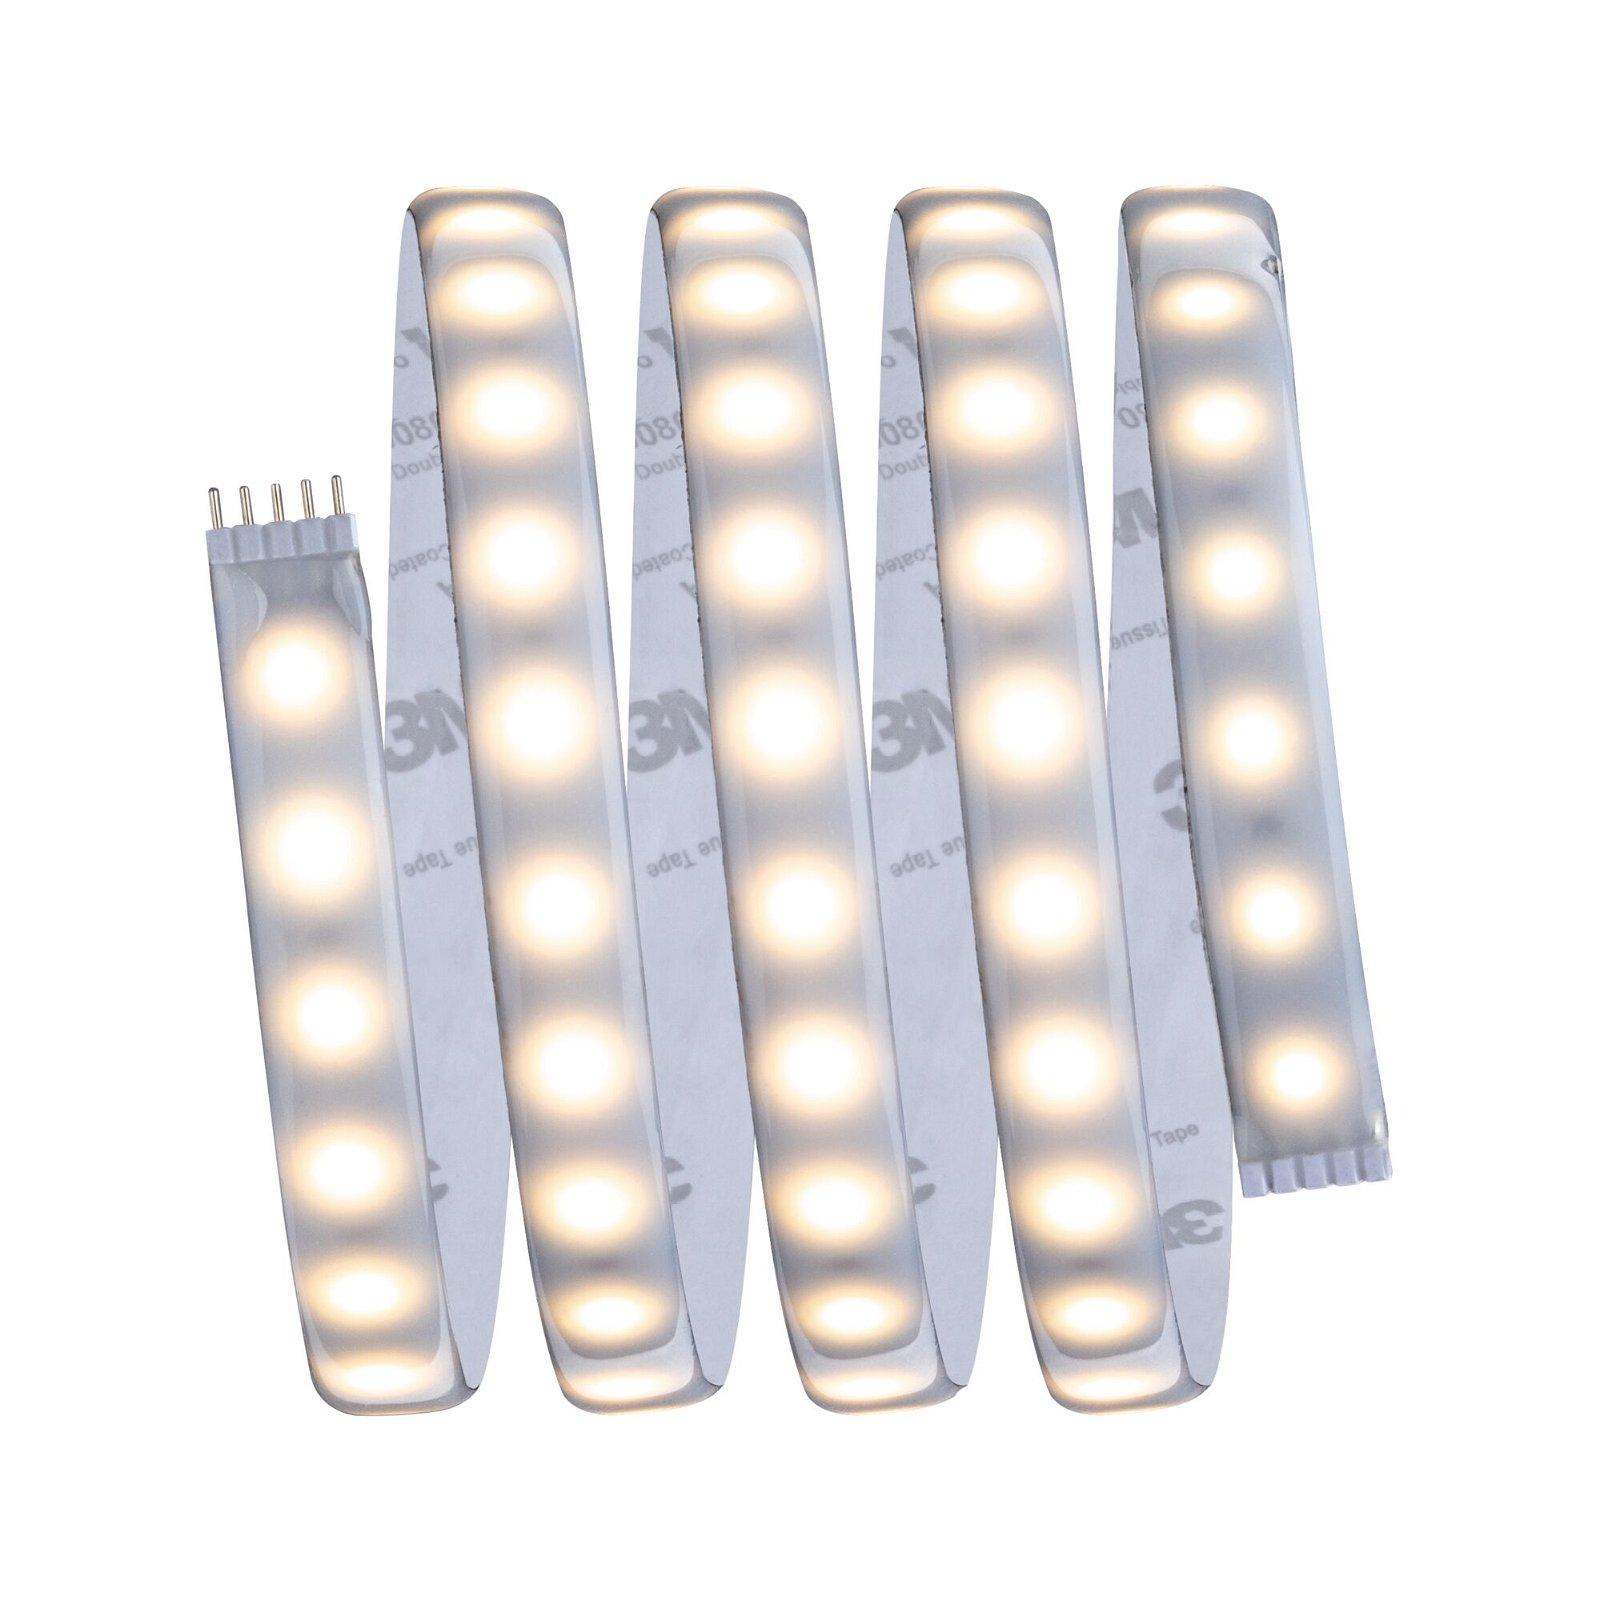 MaxLED 500 Strip LED Blanc chaud 1,5m recouvert 9W 825lm 2700K 20VA